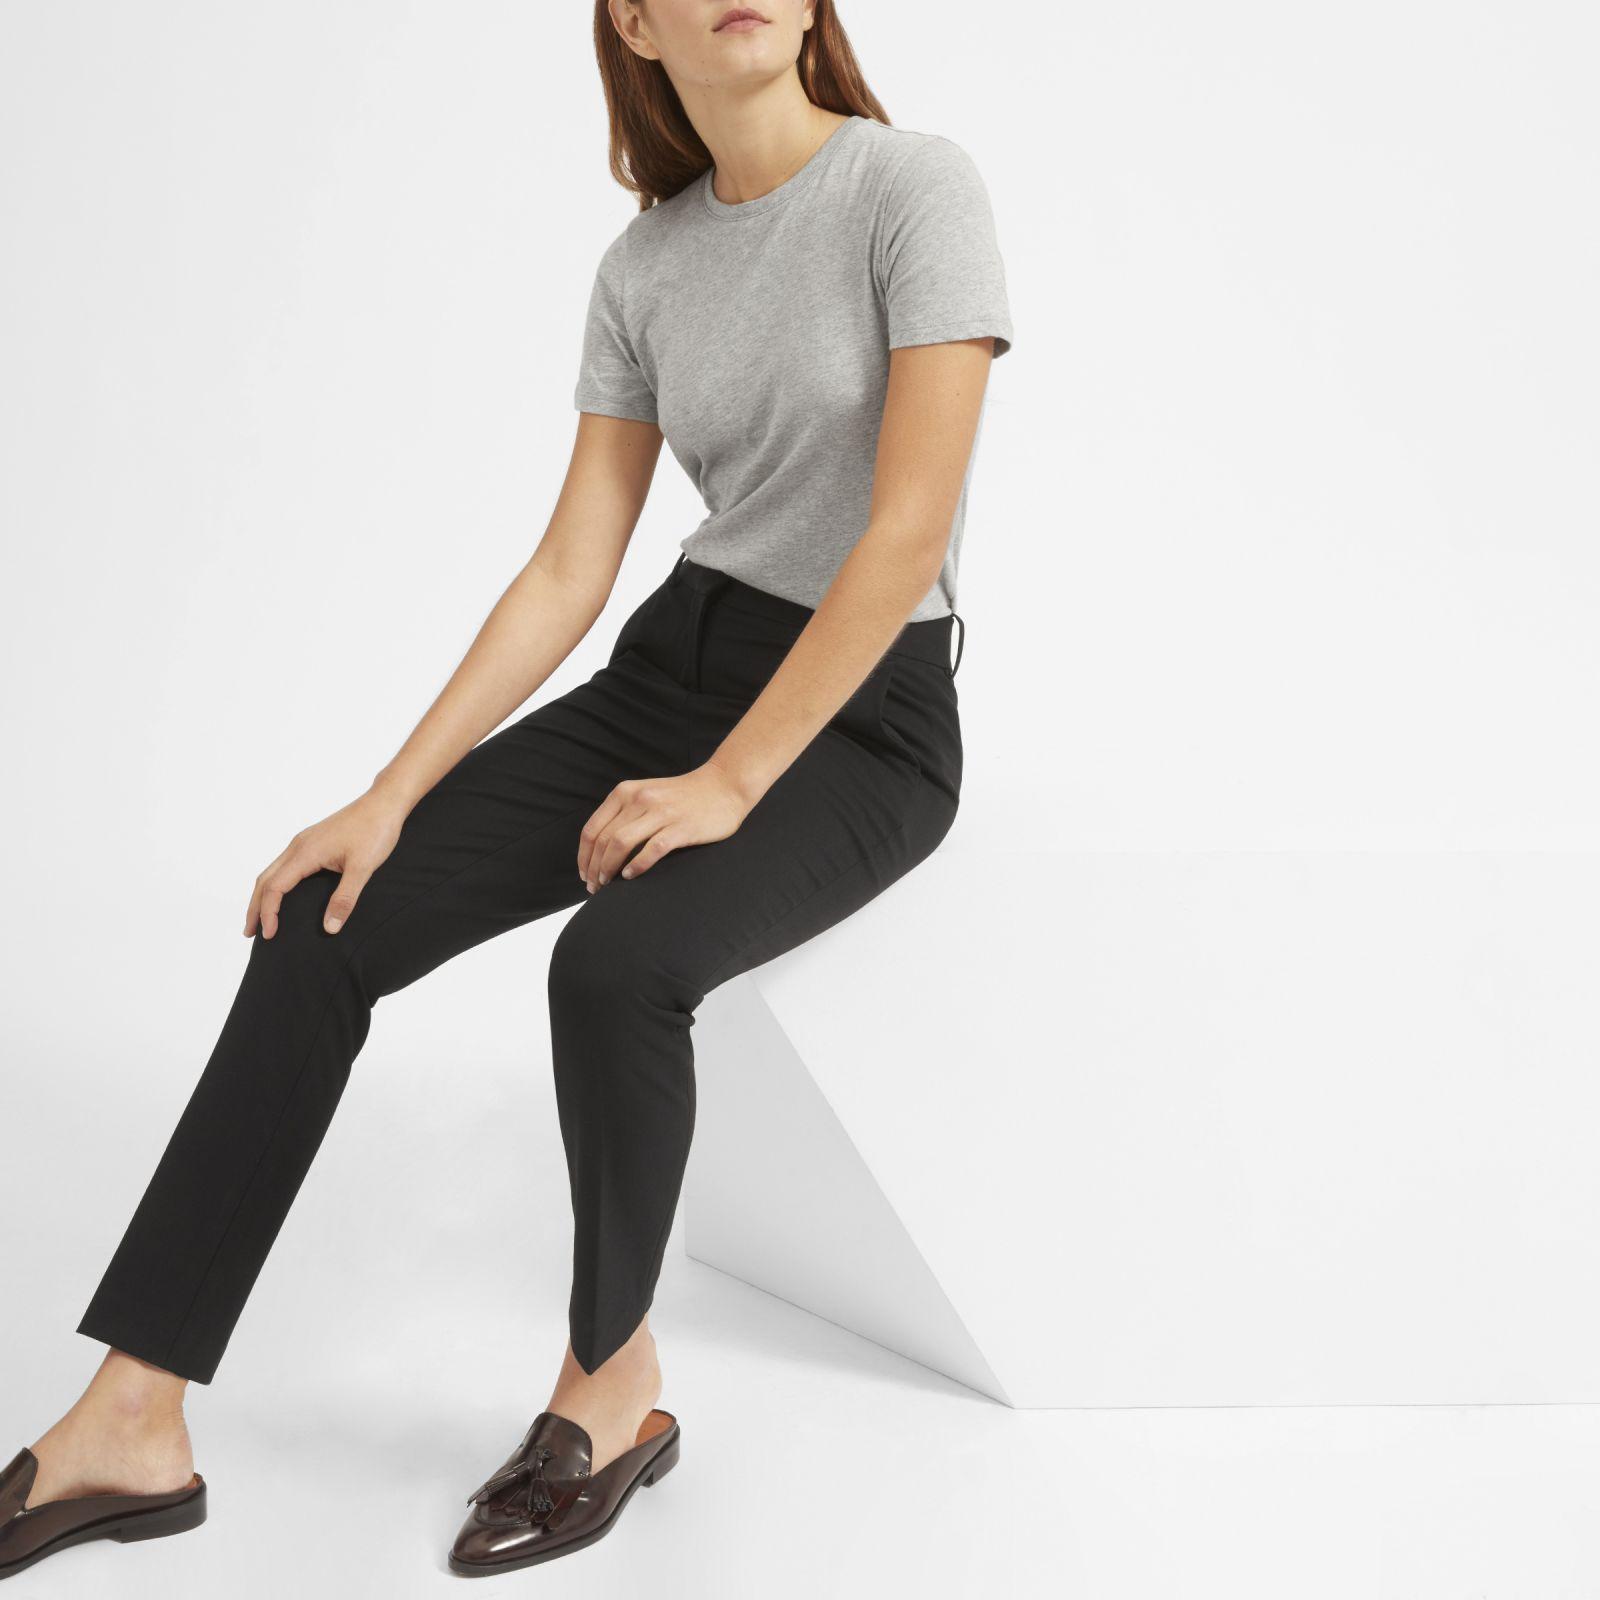 women's cotton crew t-shirt by everlane in heather grey, size xl